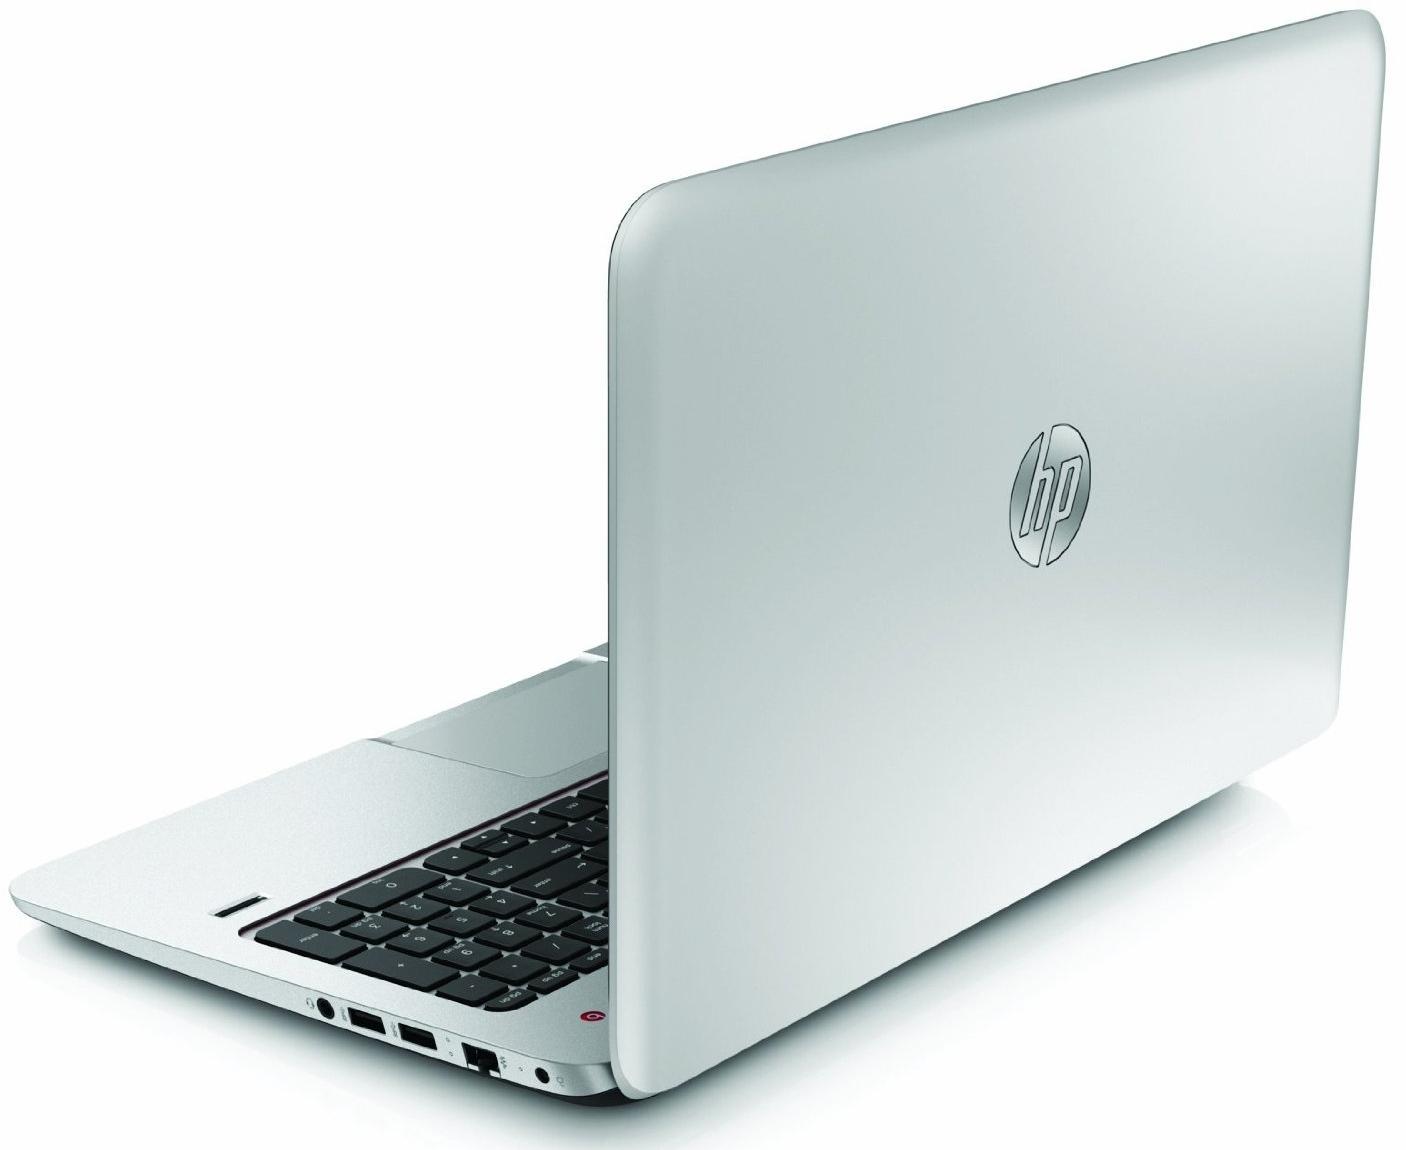 Putoinformatico (by Kullman): Portátil avanzado: HP Envy 15-J170NS